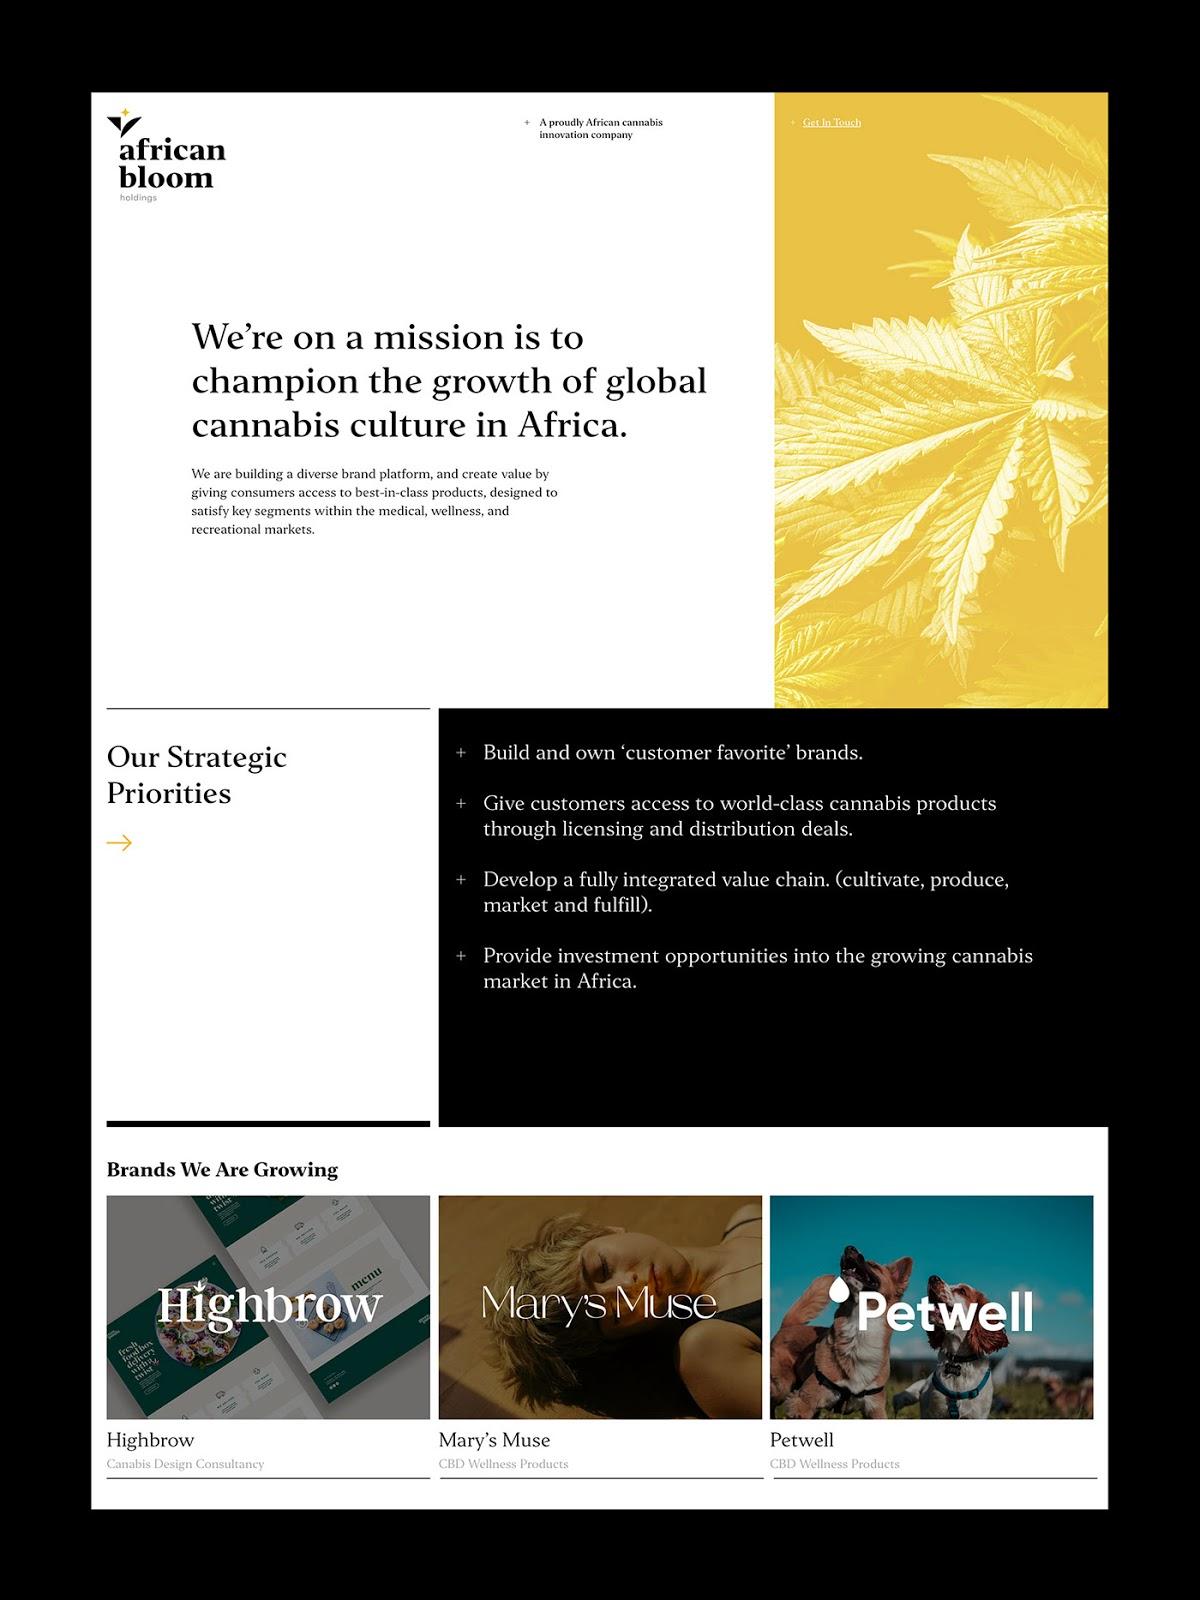 Africa Bloom Holdings品牌视觉VI设计